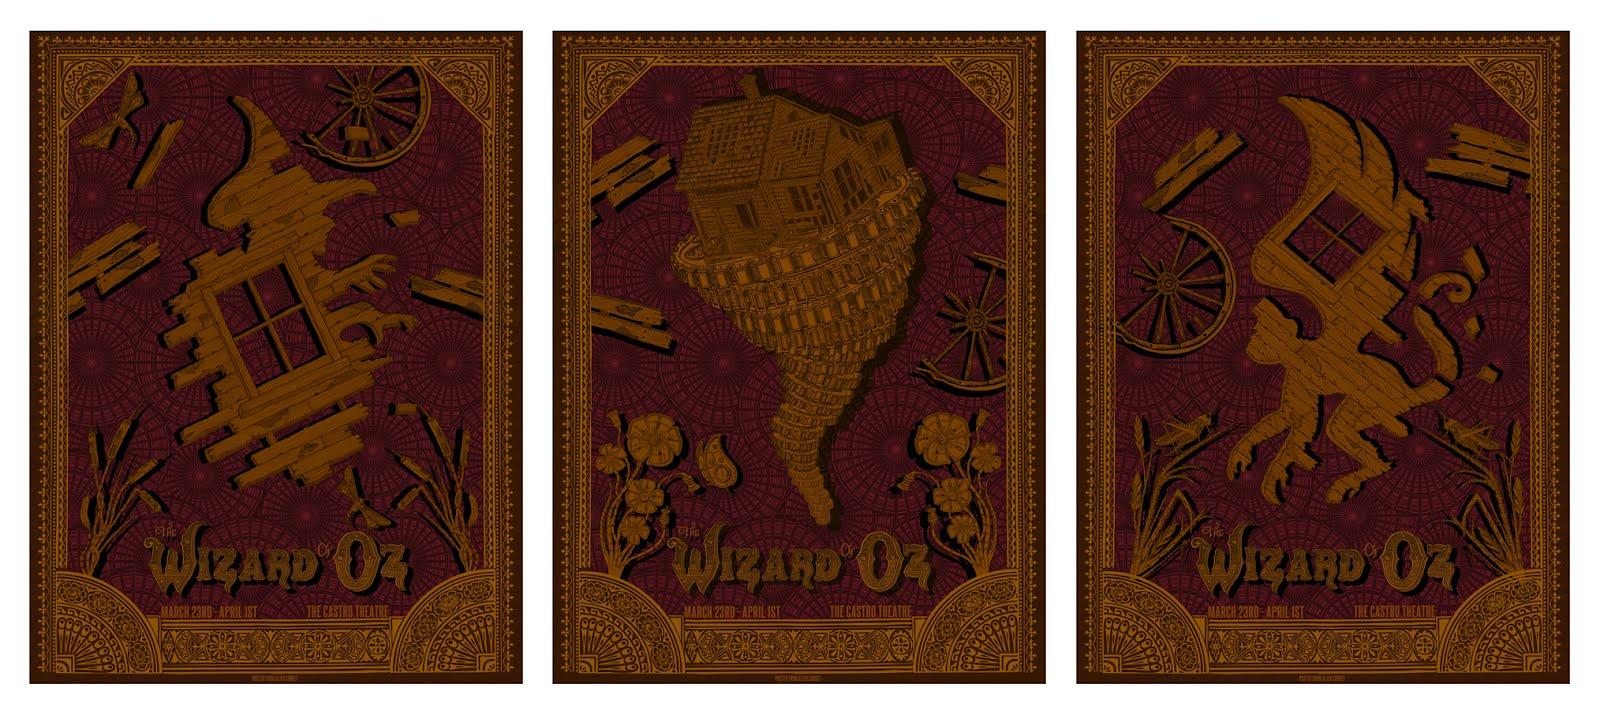 o'daniel the wizard of oz ruby